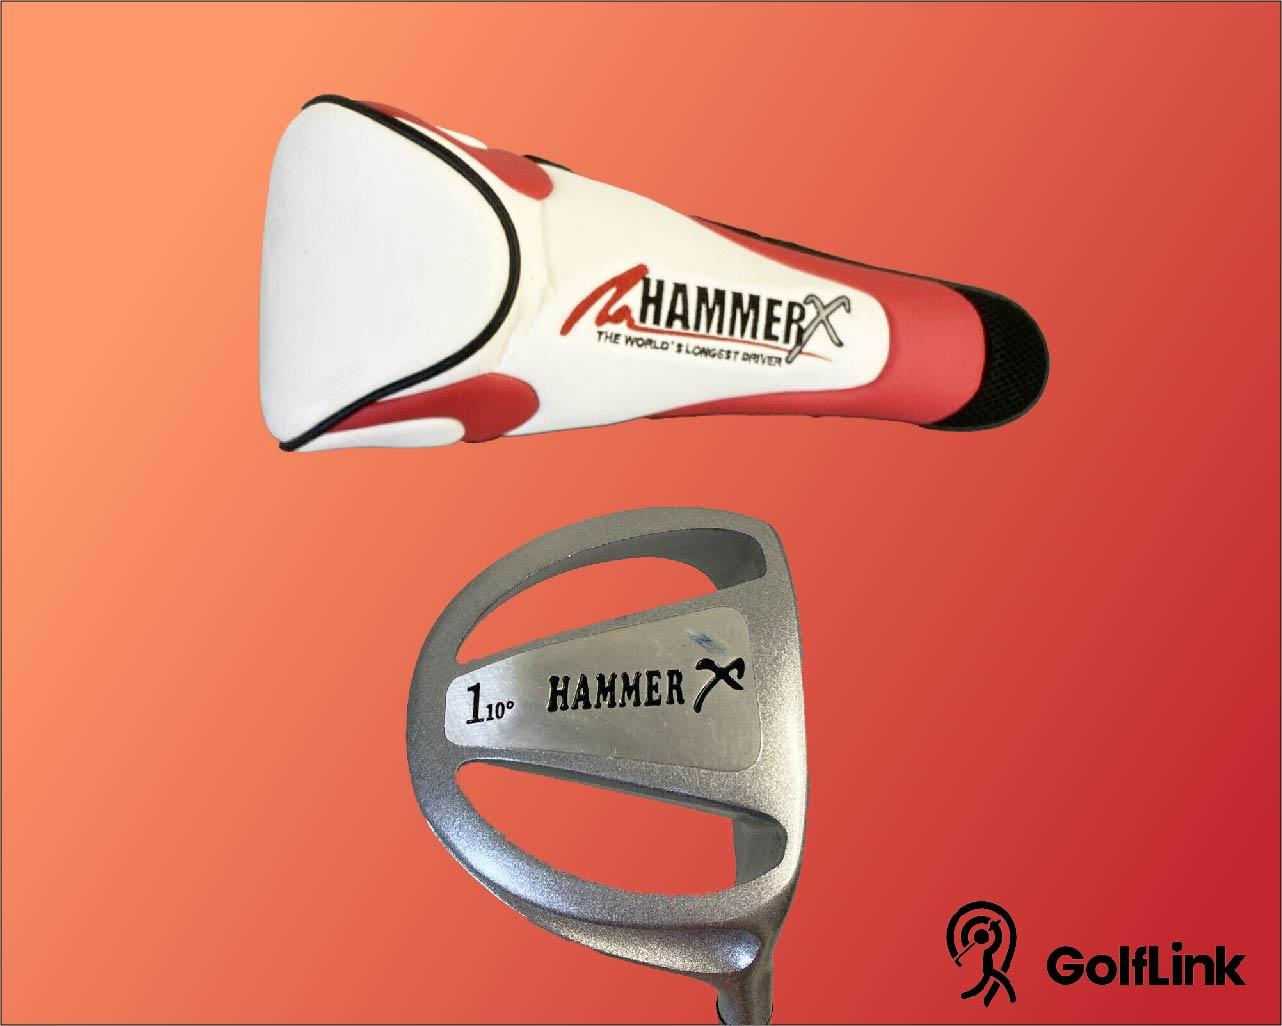 Hammer Golf Driver Review